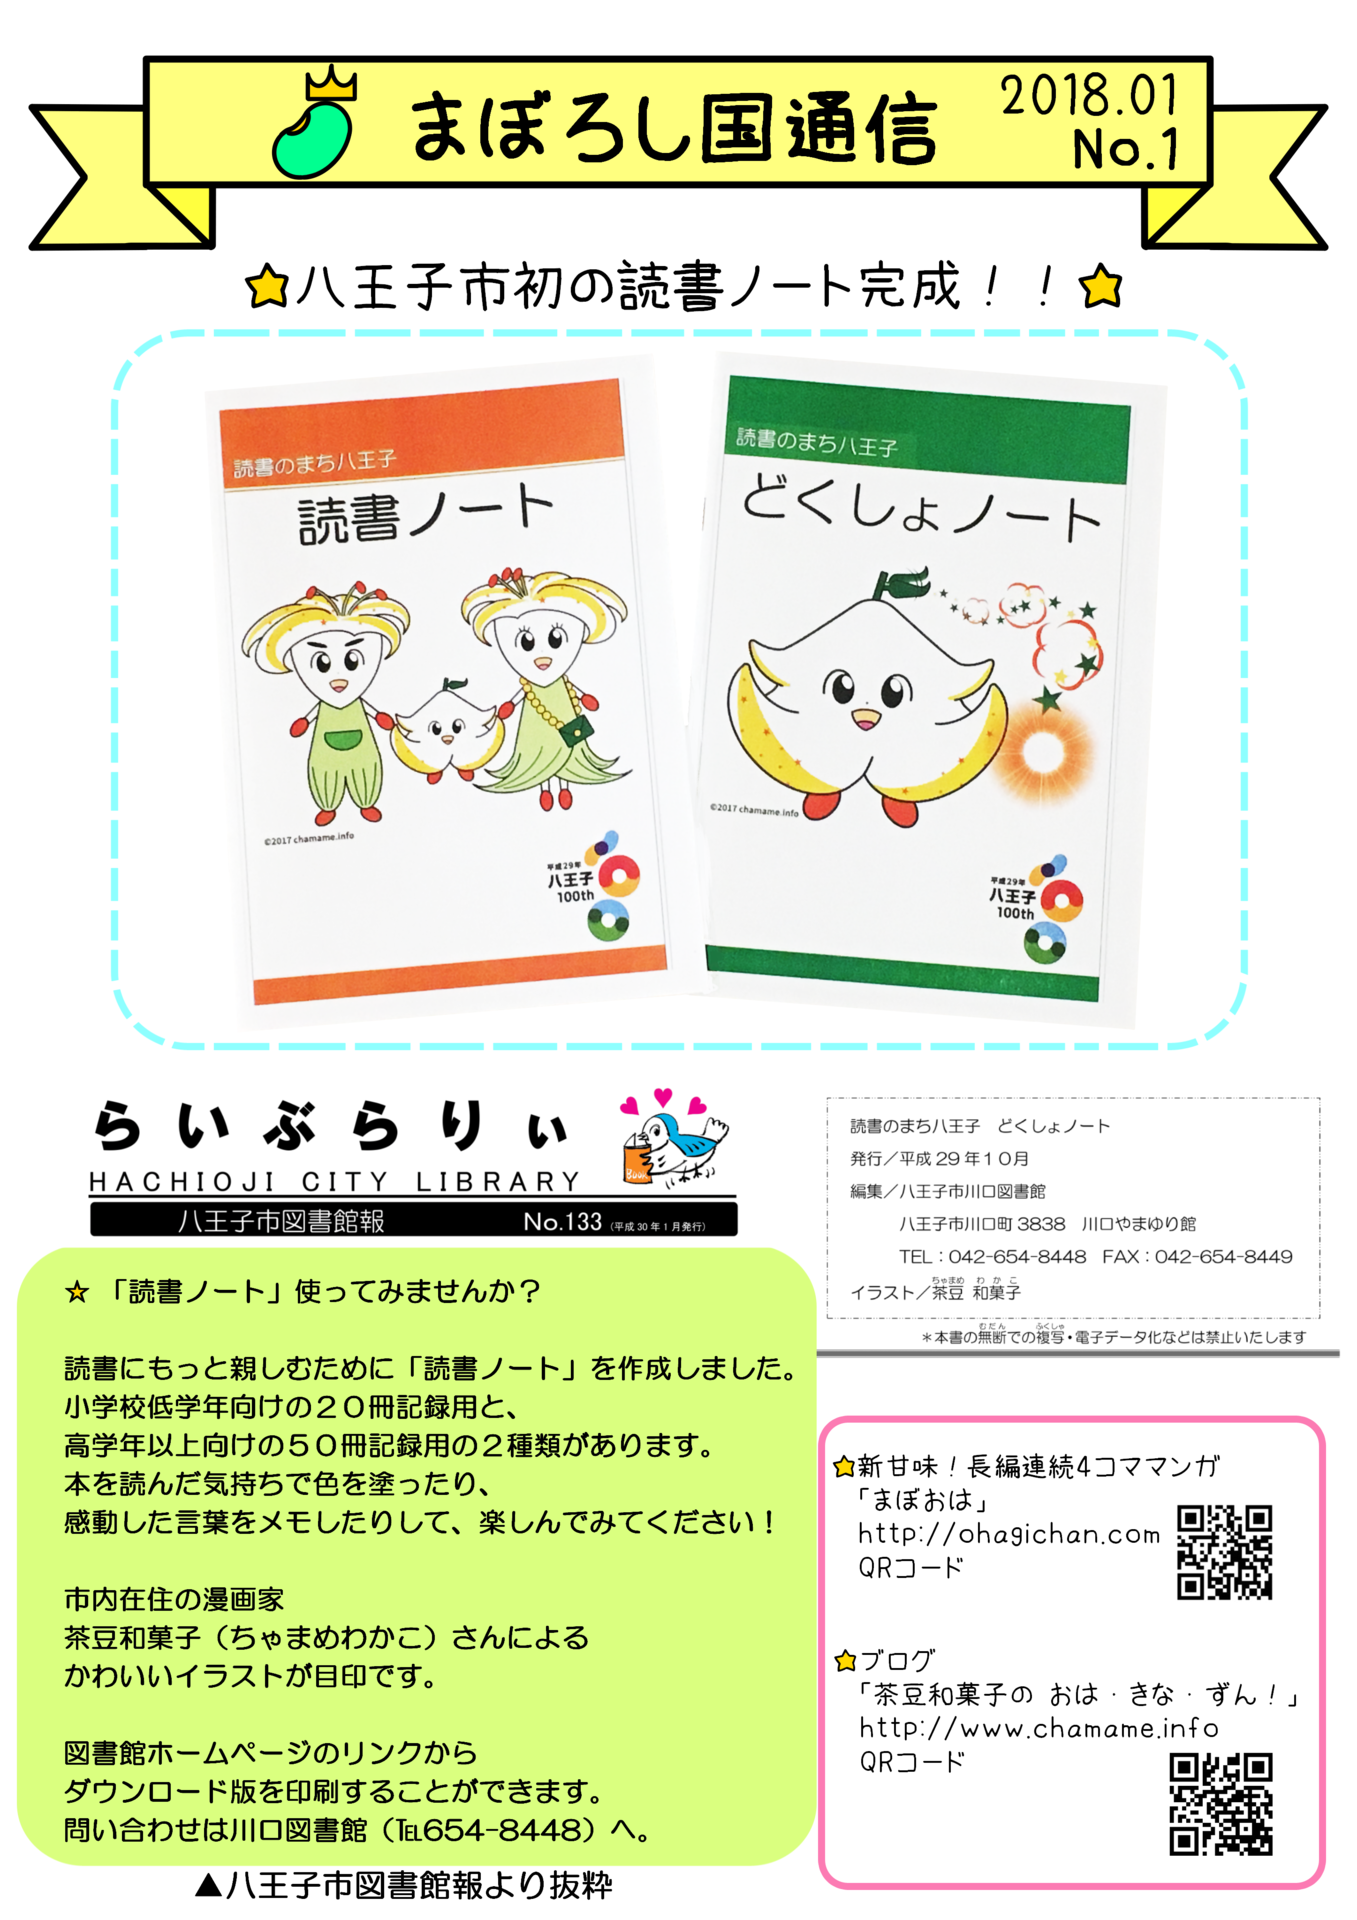 No.1_読書ノート布教用チラシ.png